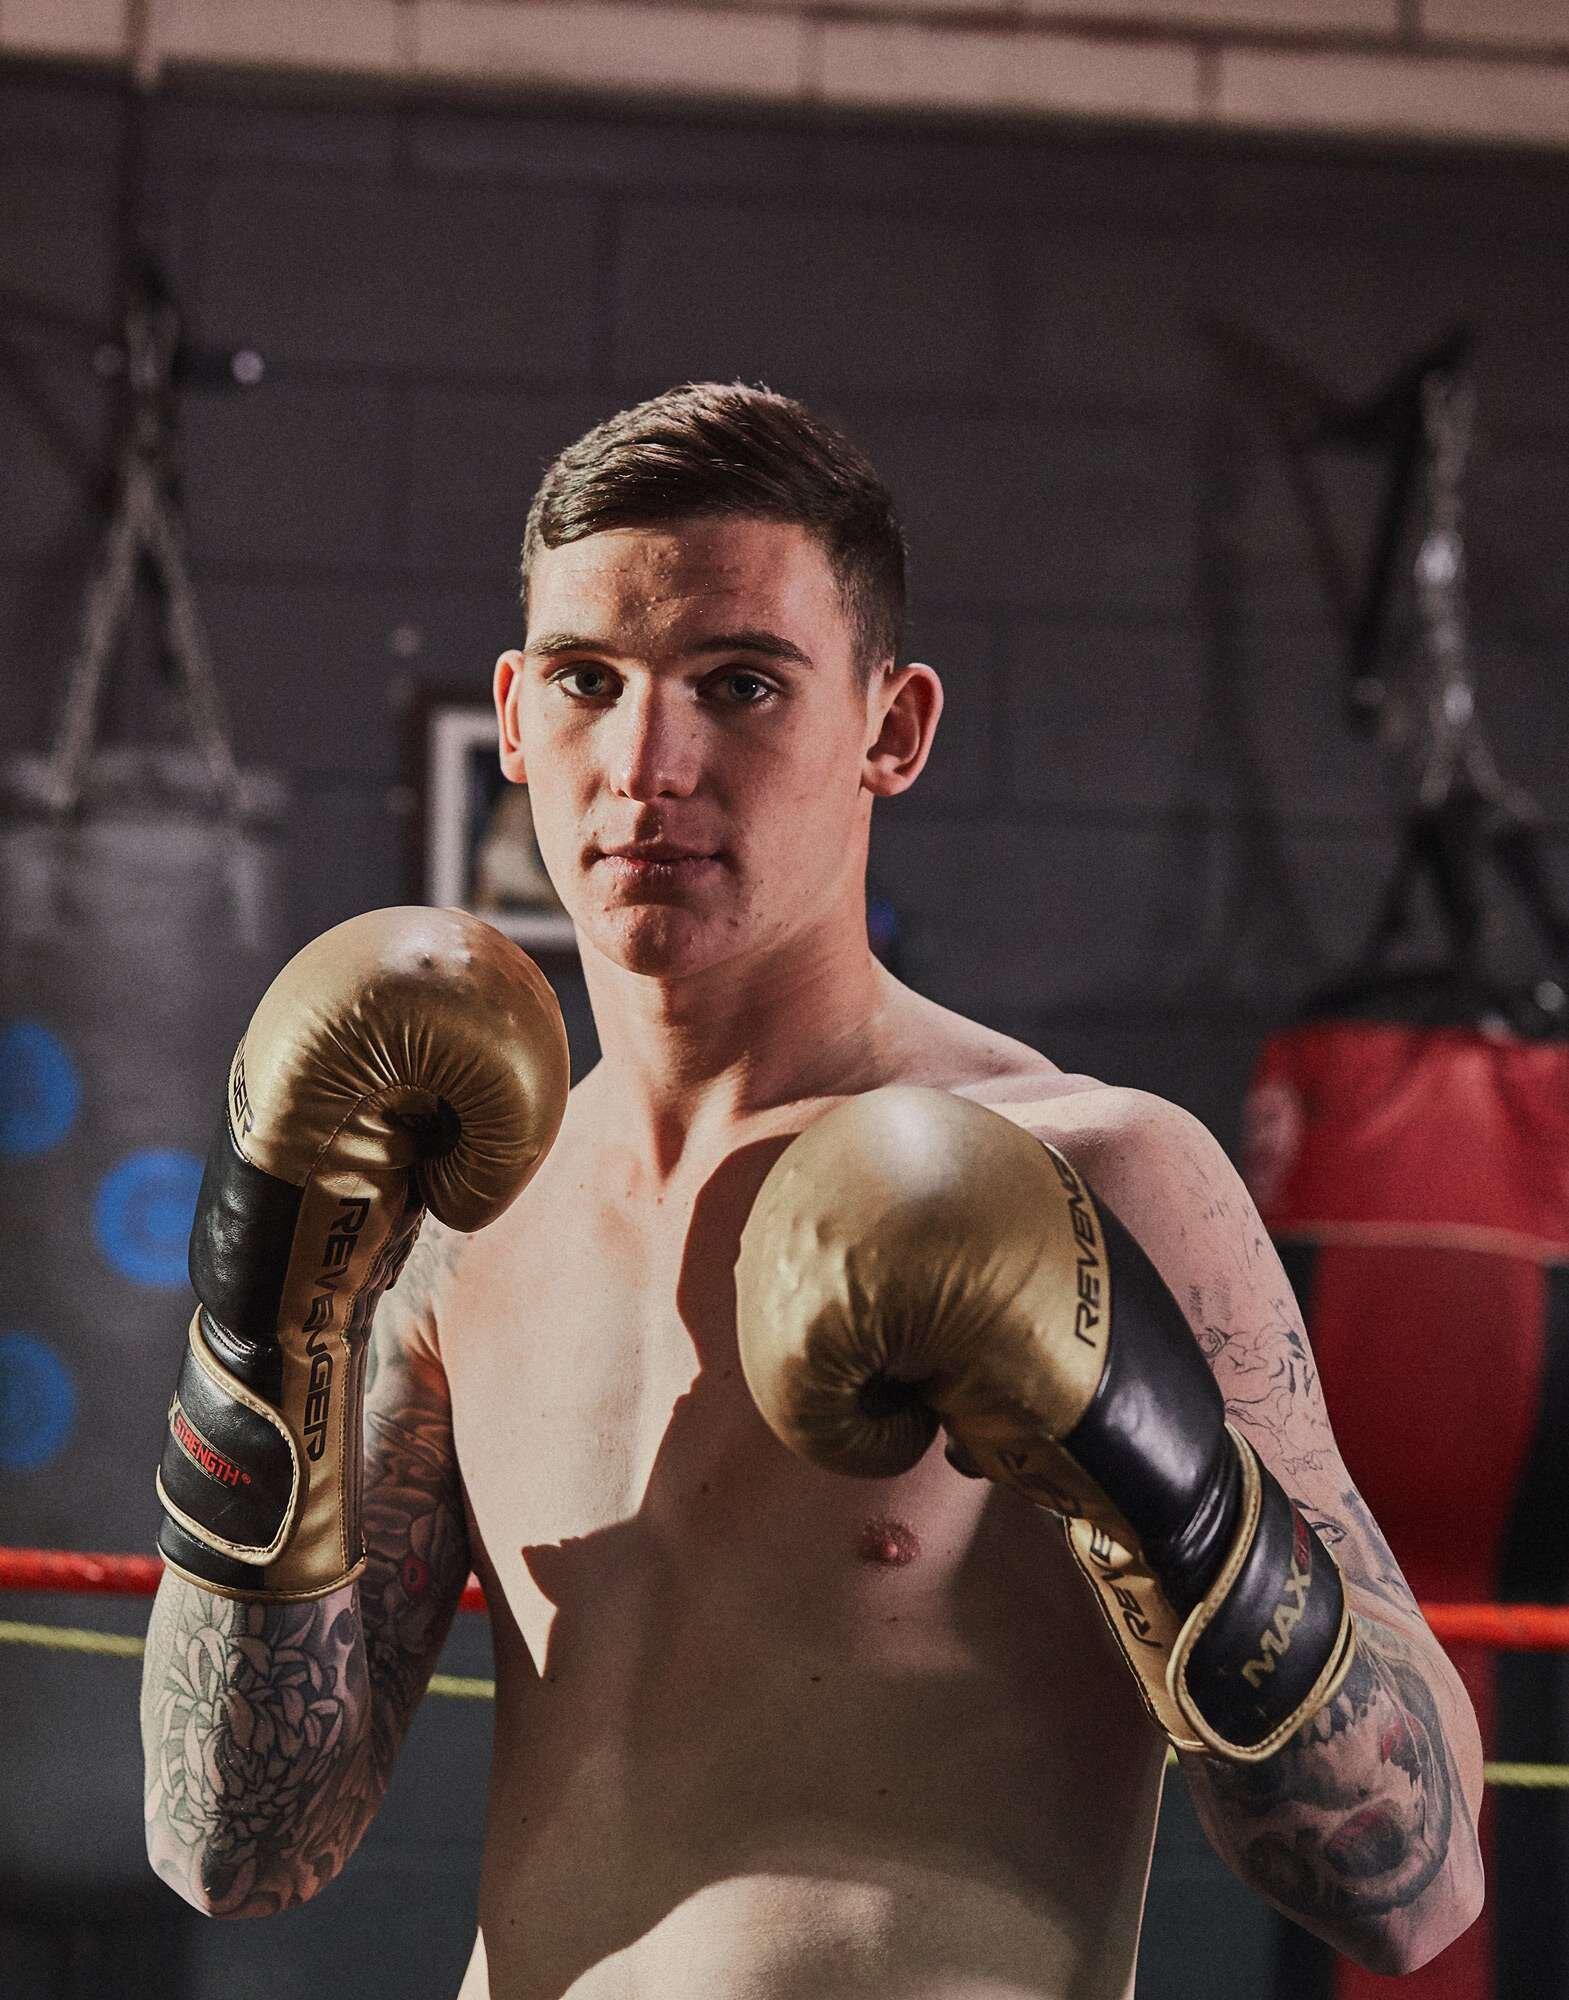 olivier-richomme-ultimate-boxer-4.jpg